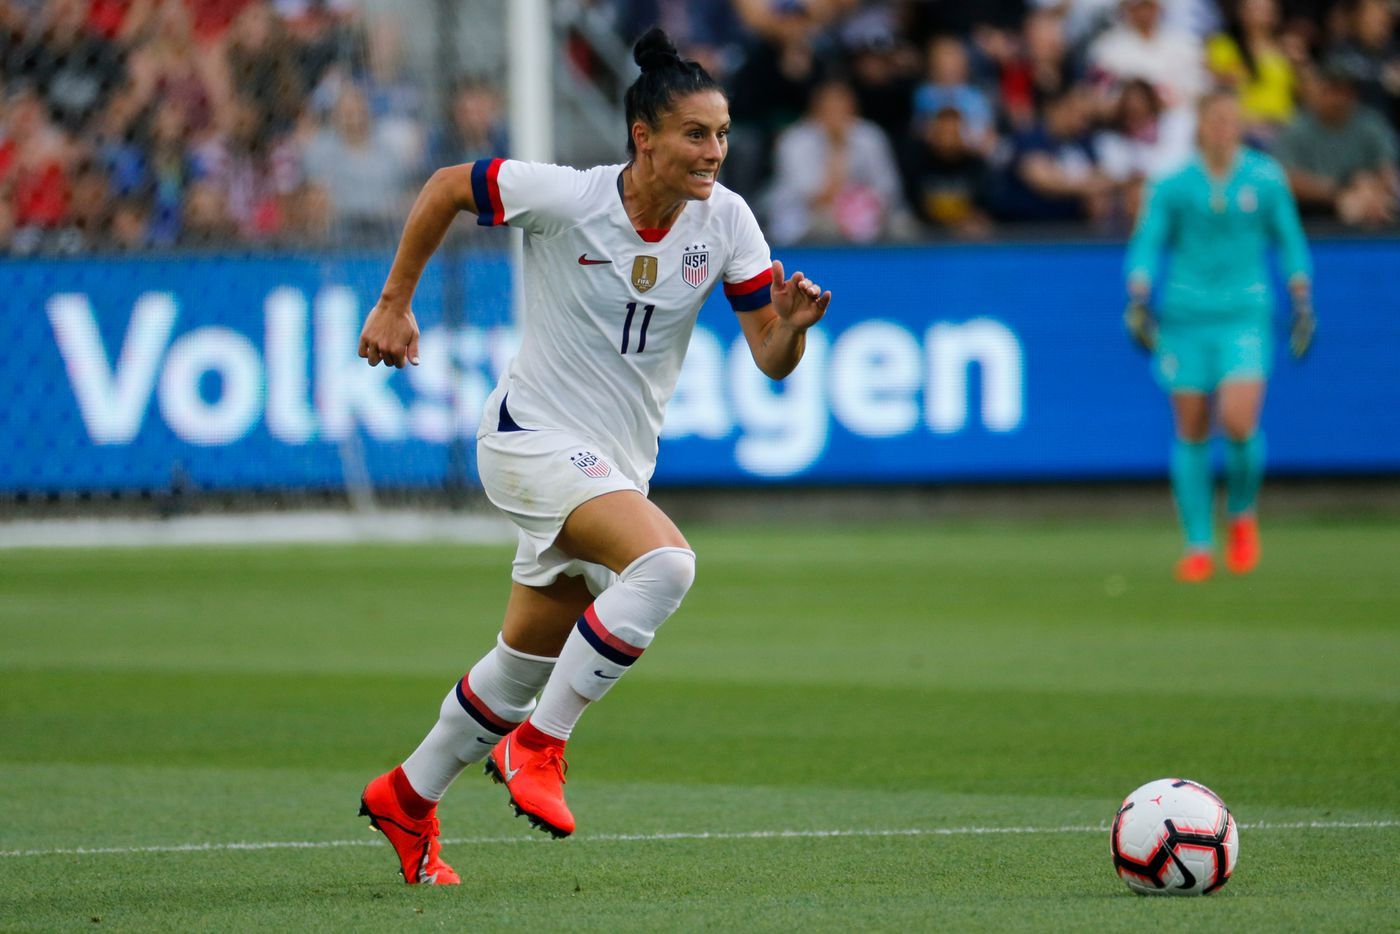 cb3e1422a Ali Krieger earned her 99th career U.S. national team cap in an April  friendly against Belgium